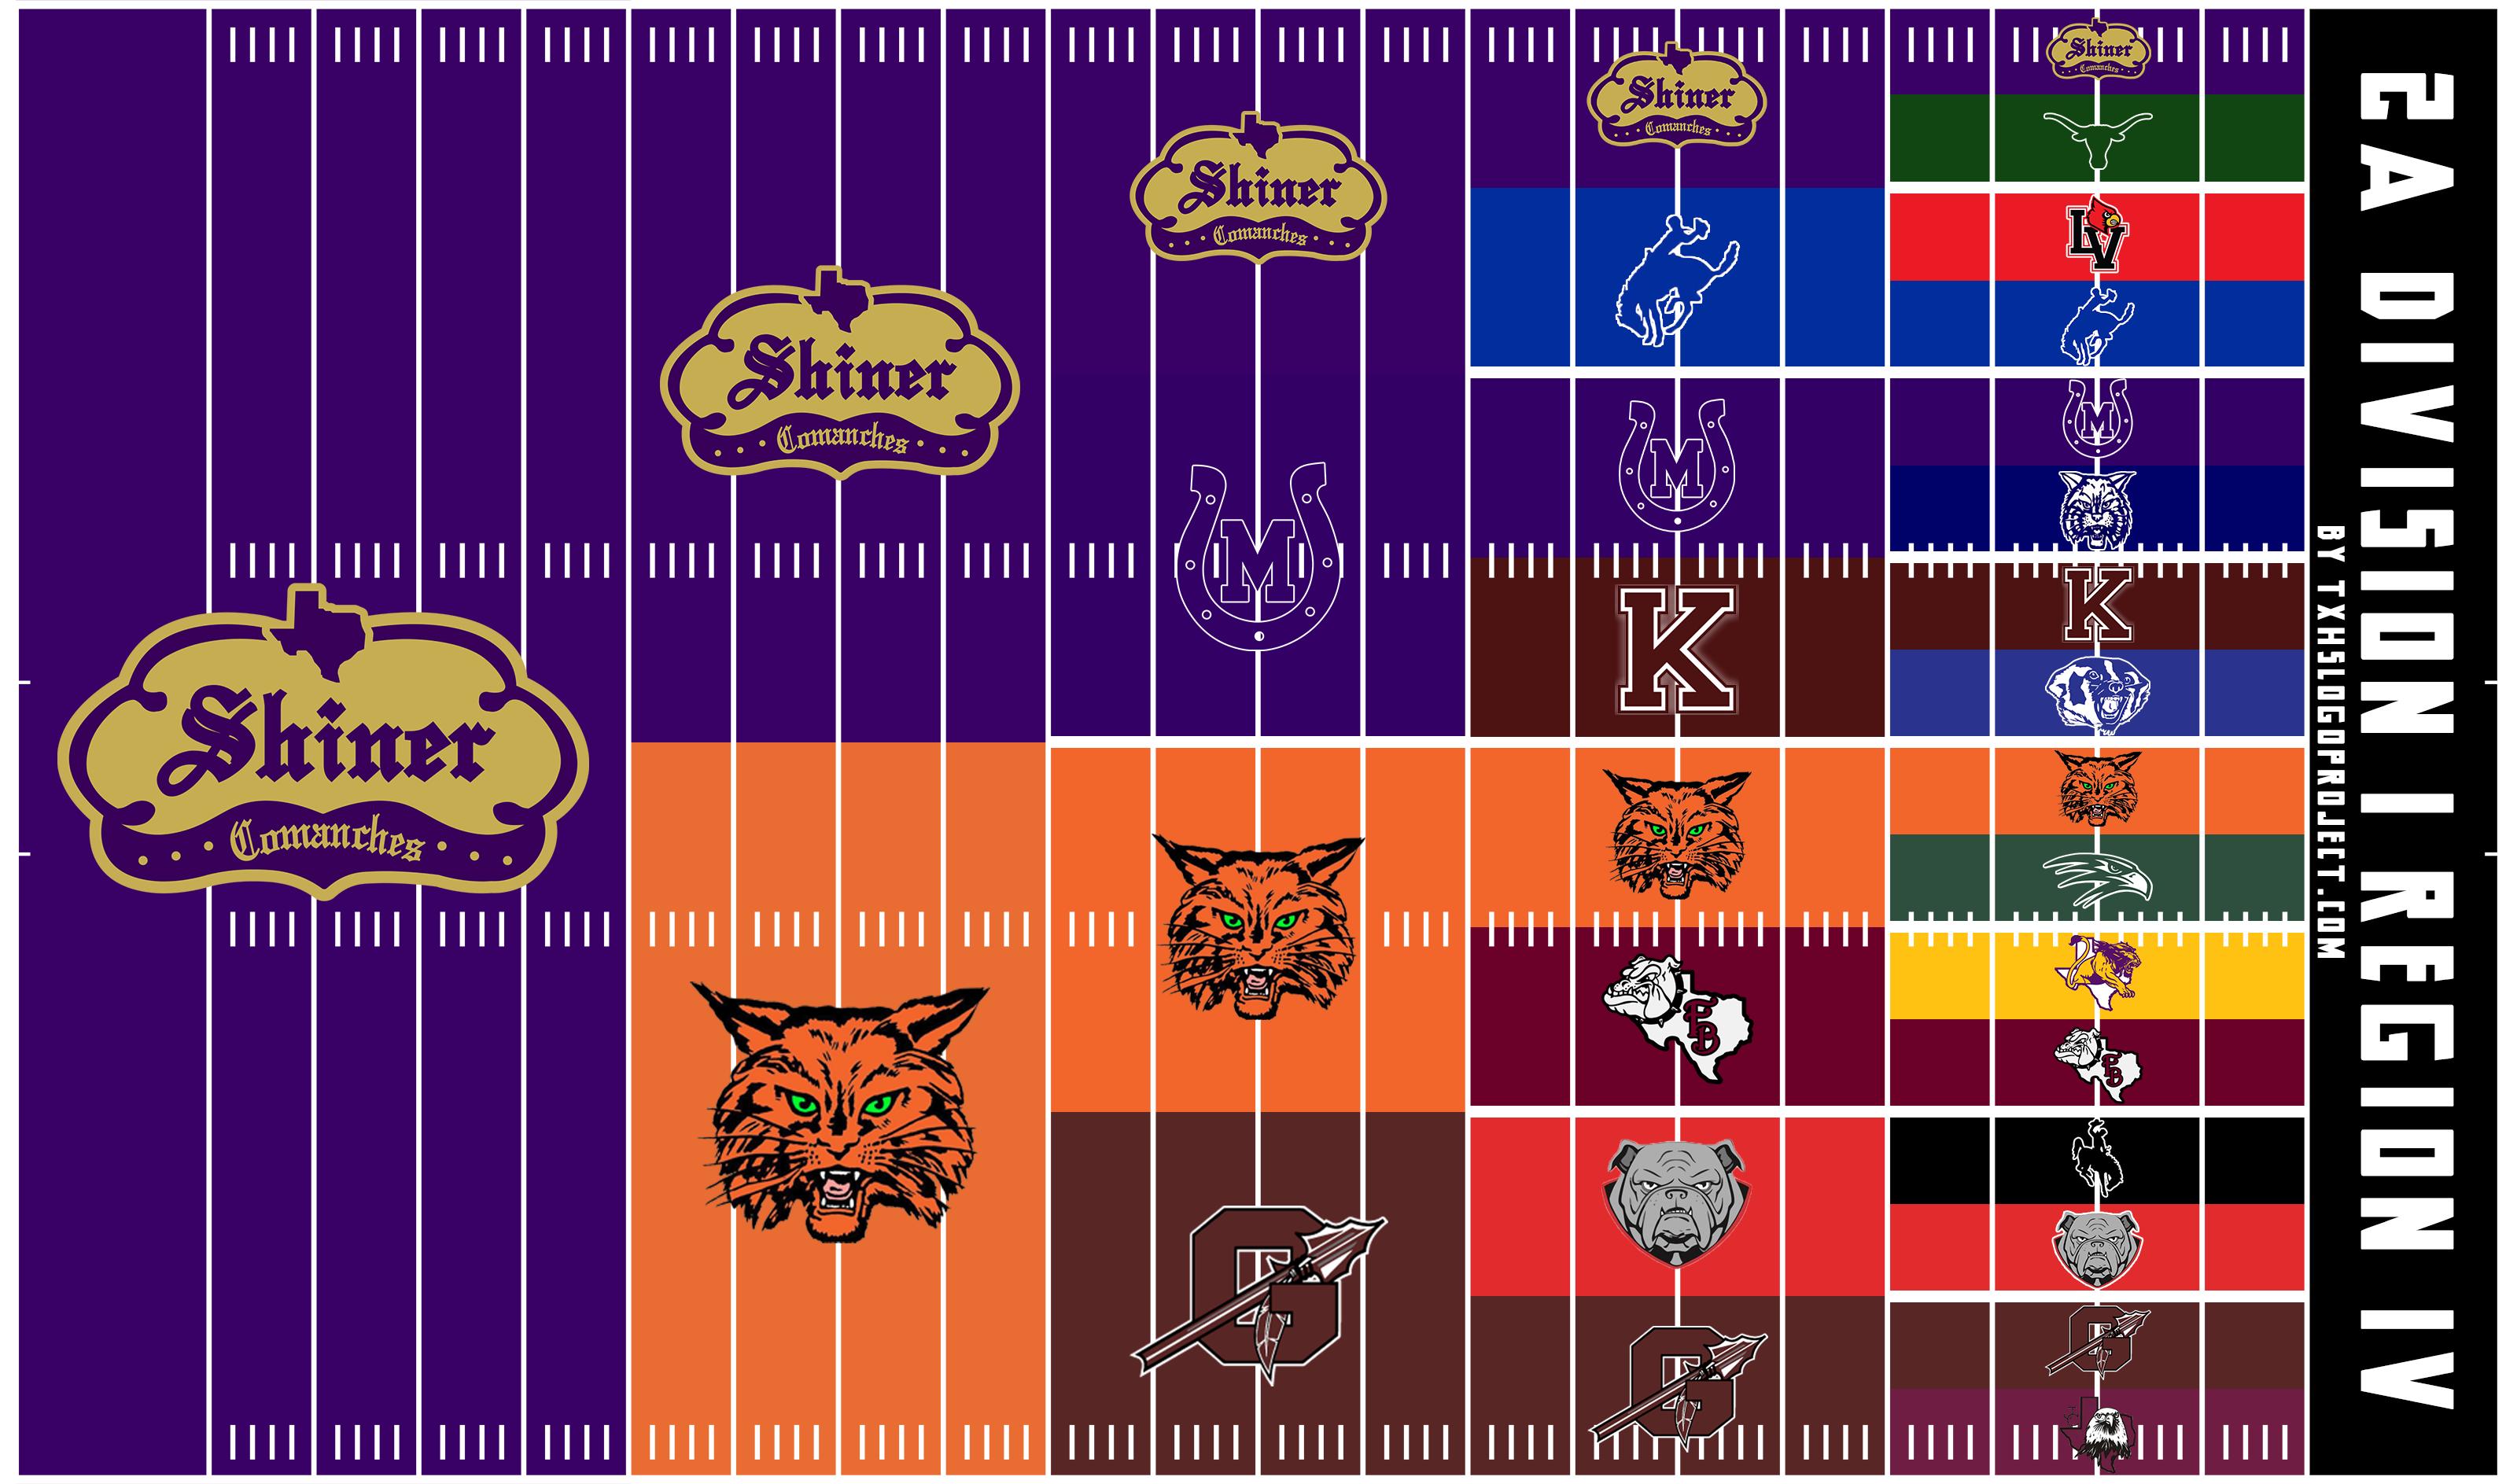 2A Division I Region IV